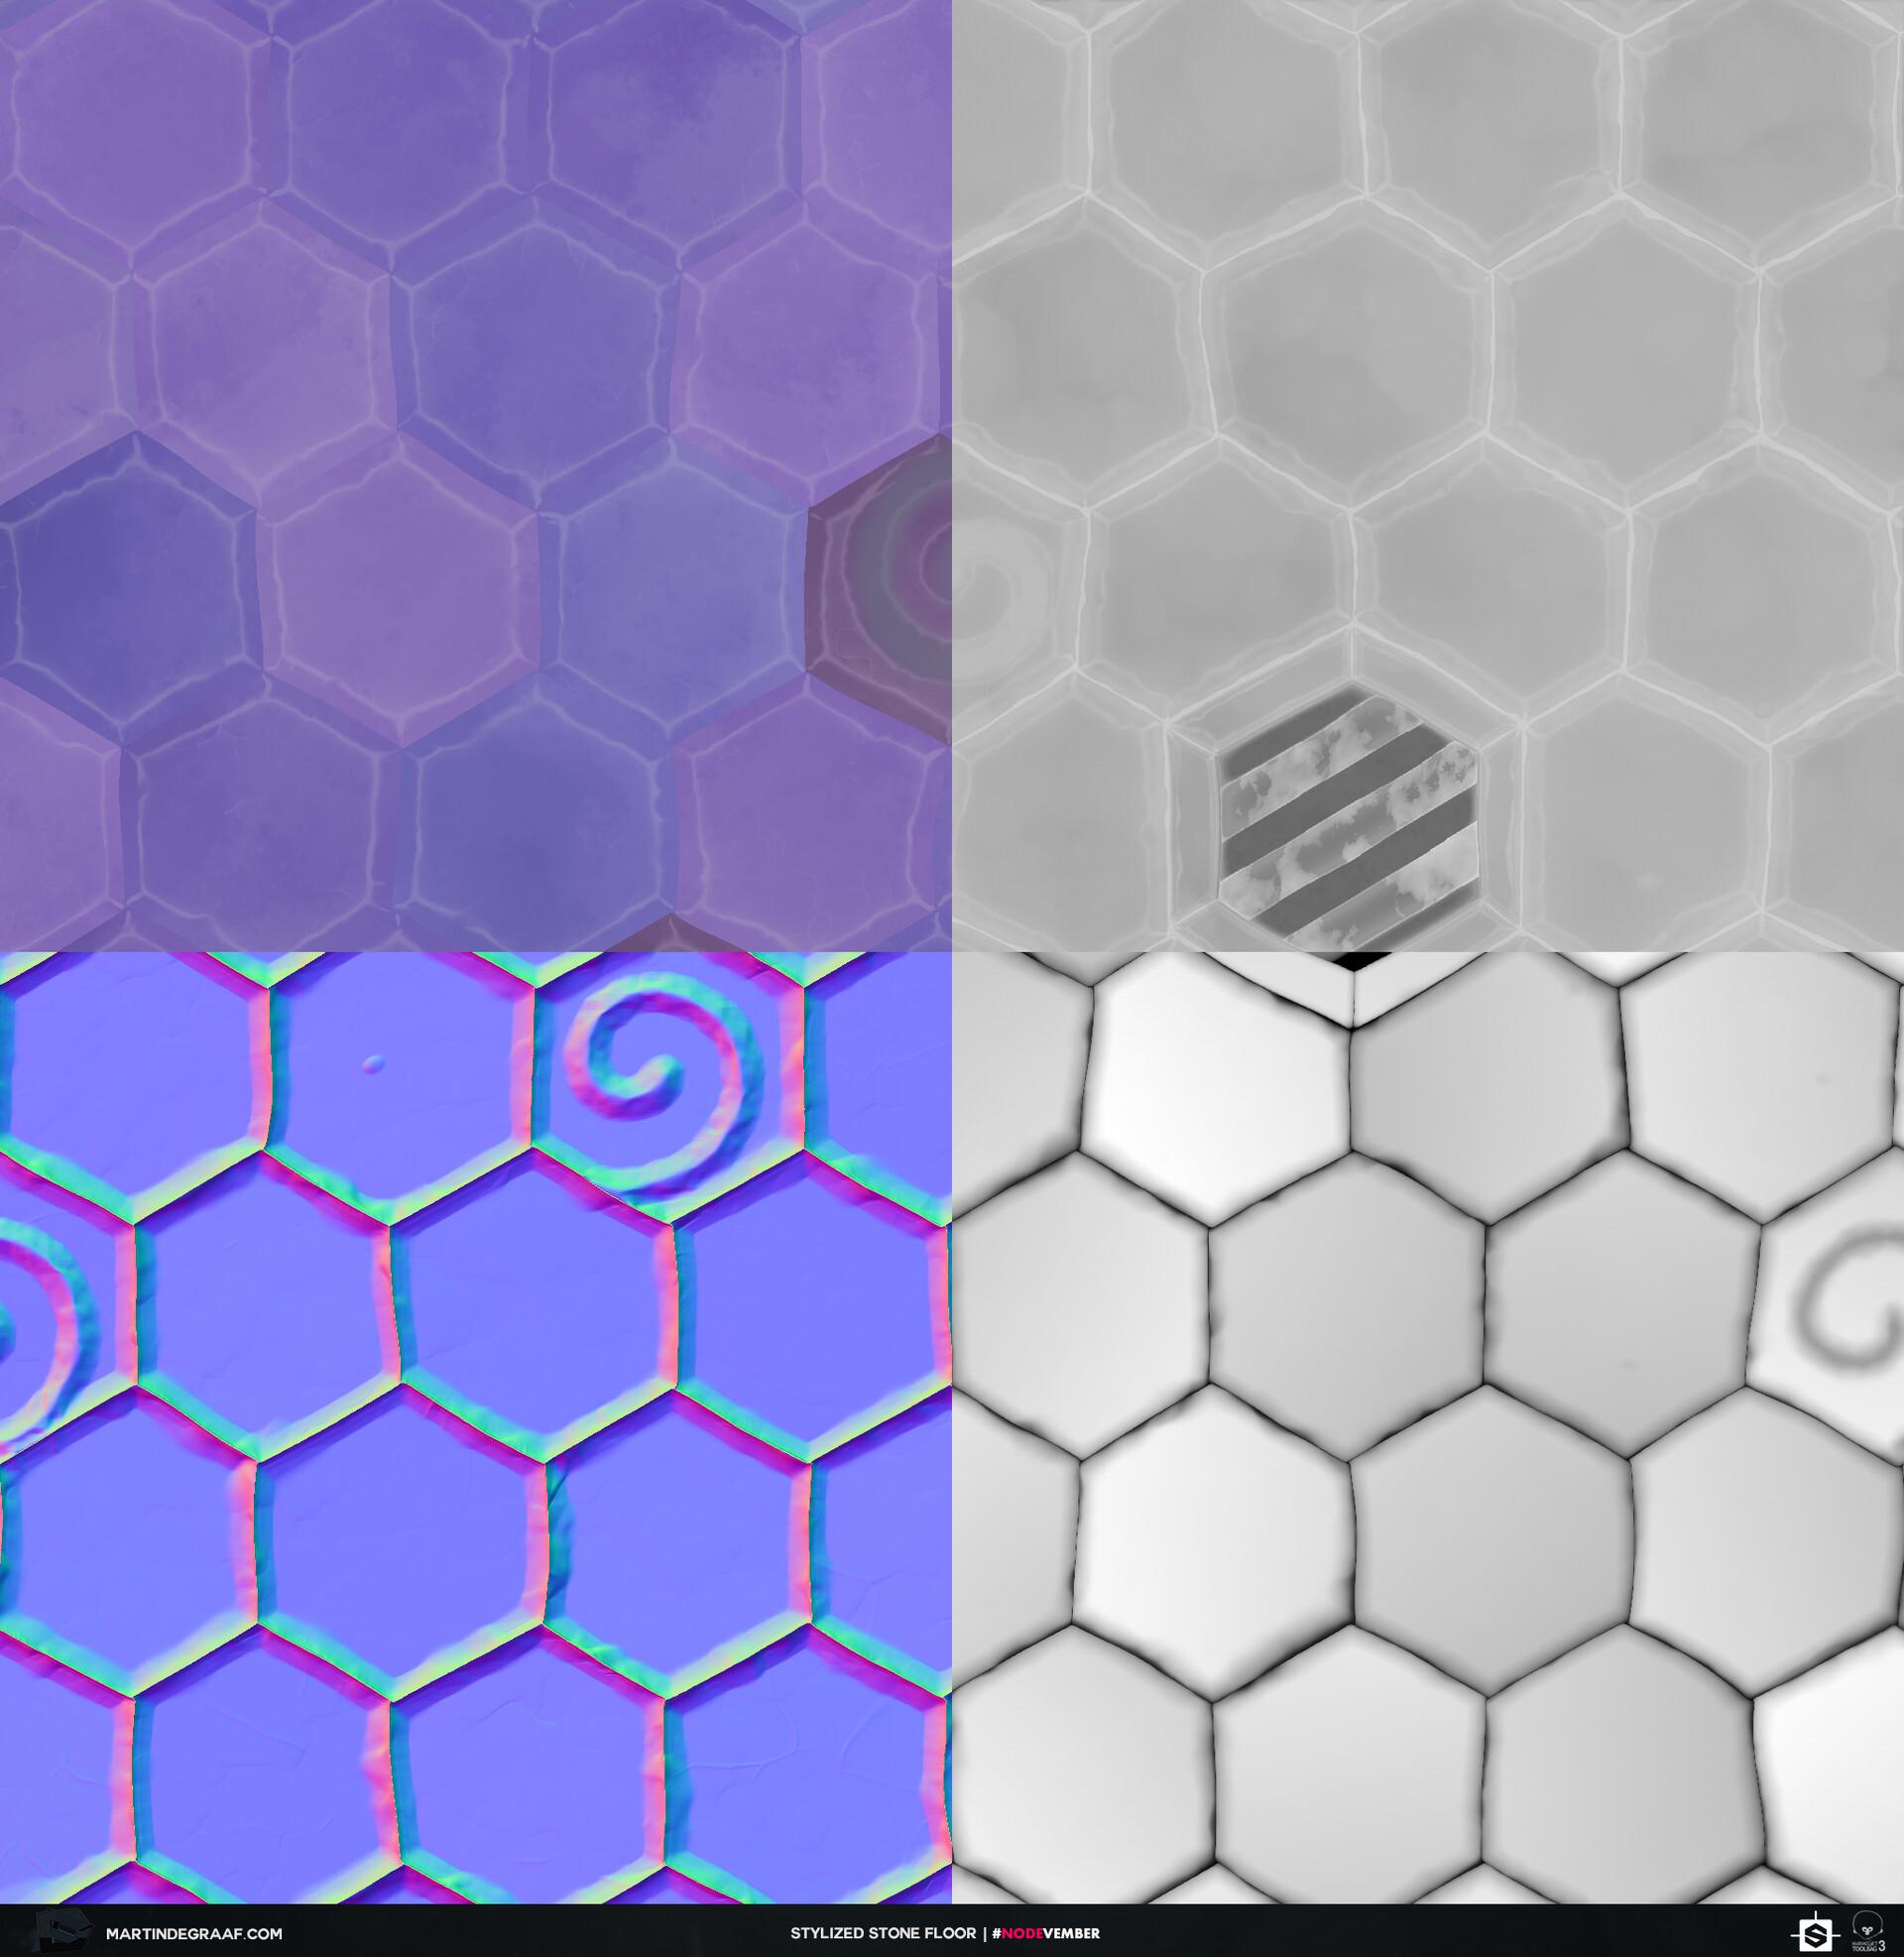 Martin de graaf stylized stone floor substance texturesheet martin de graaf 2019